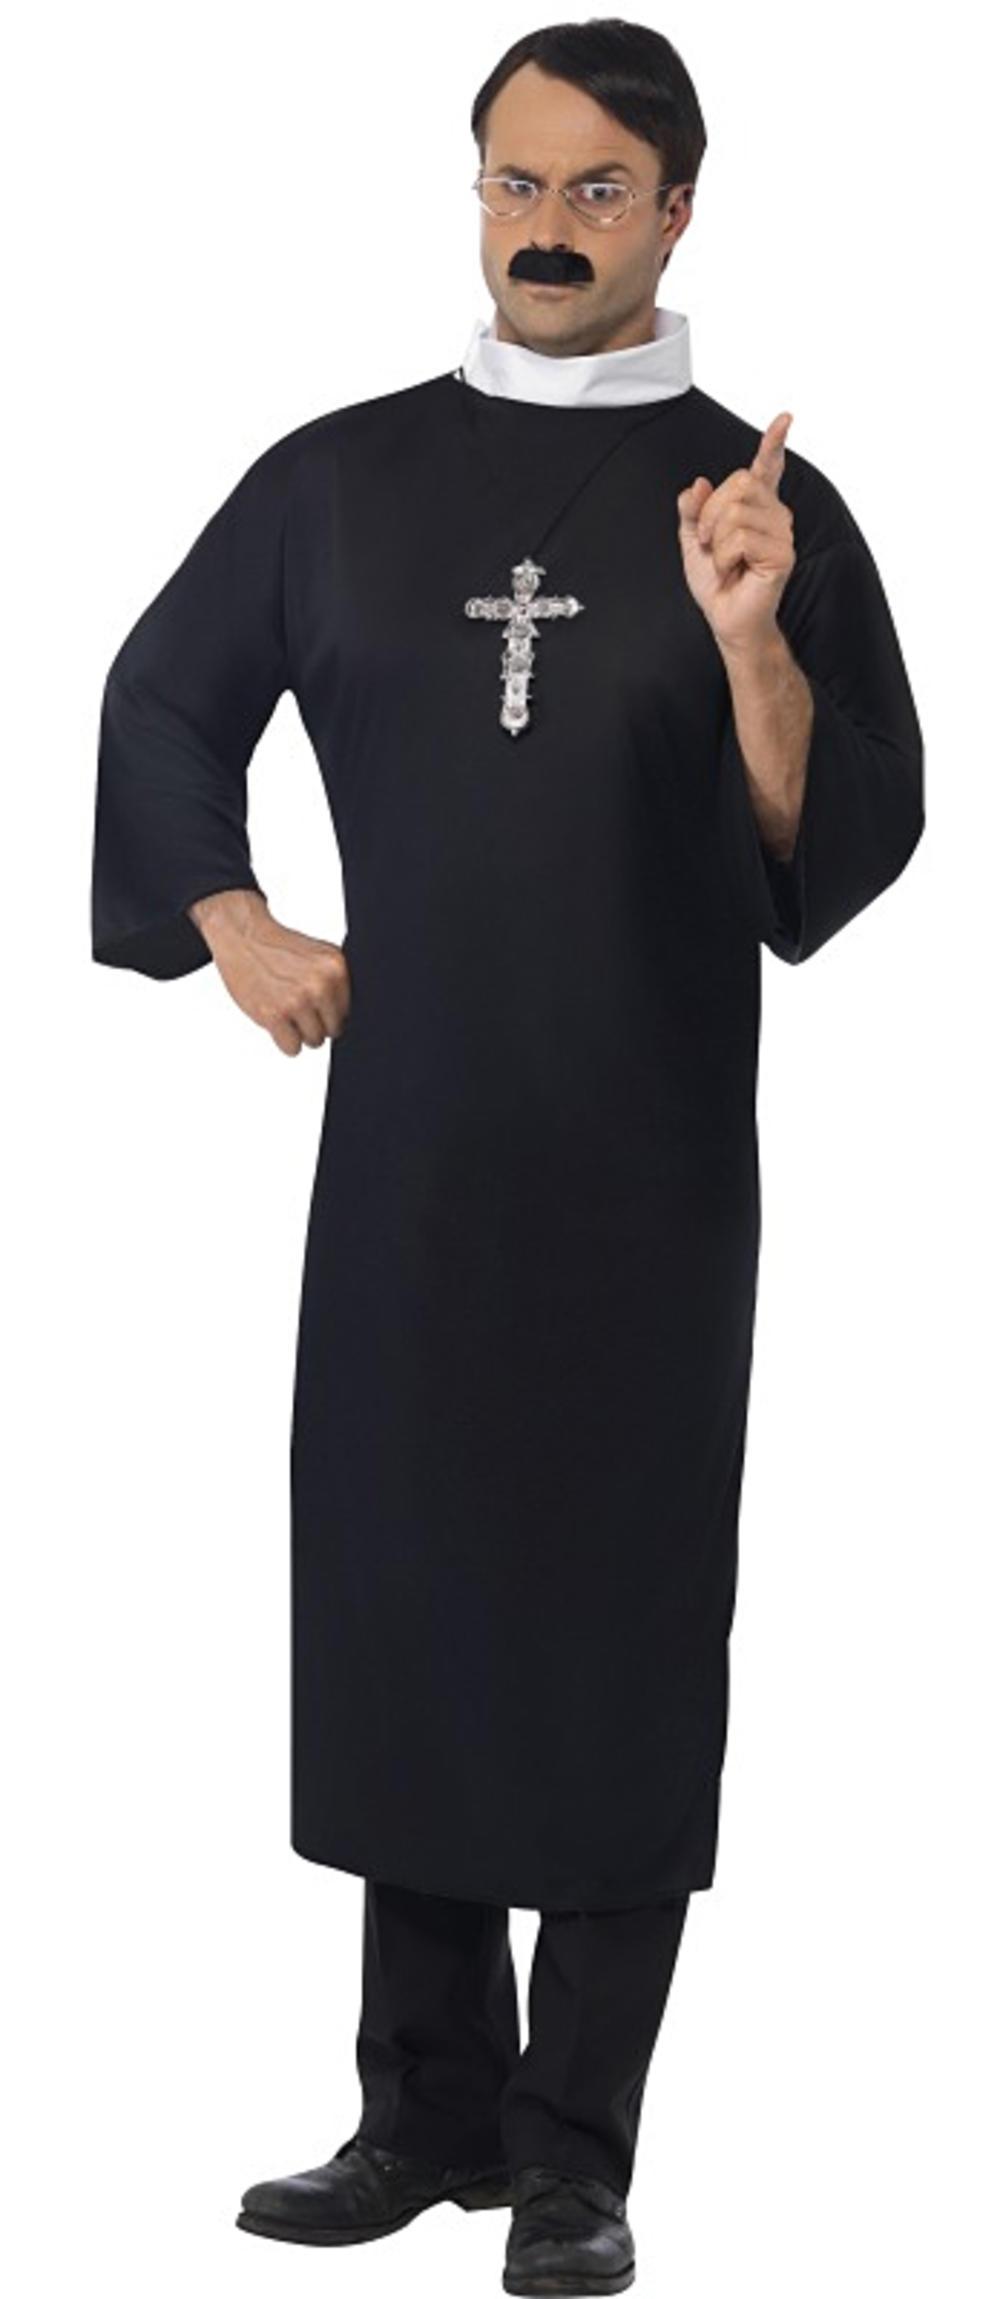 Priest Mens Fancy Dress Religious Holy Church Vicar Saints & Sinners Costume